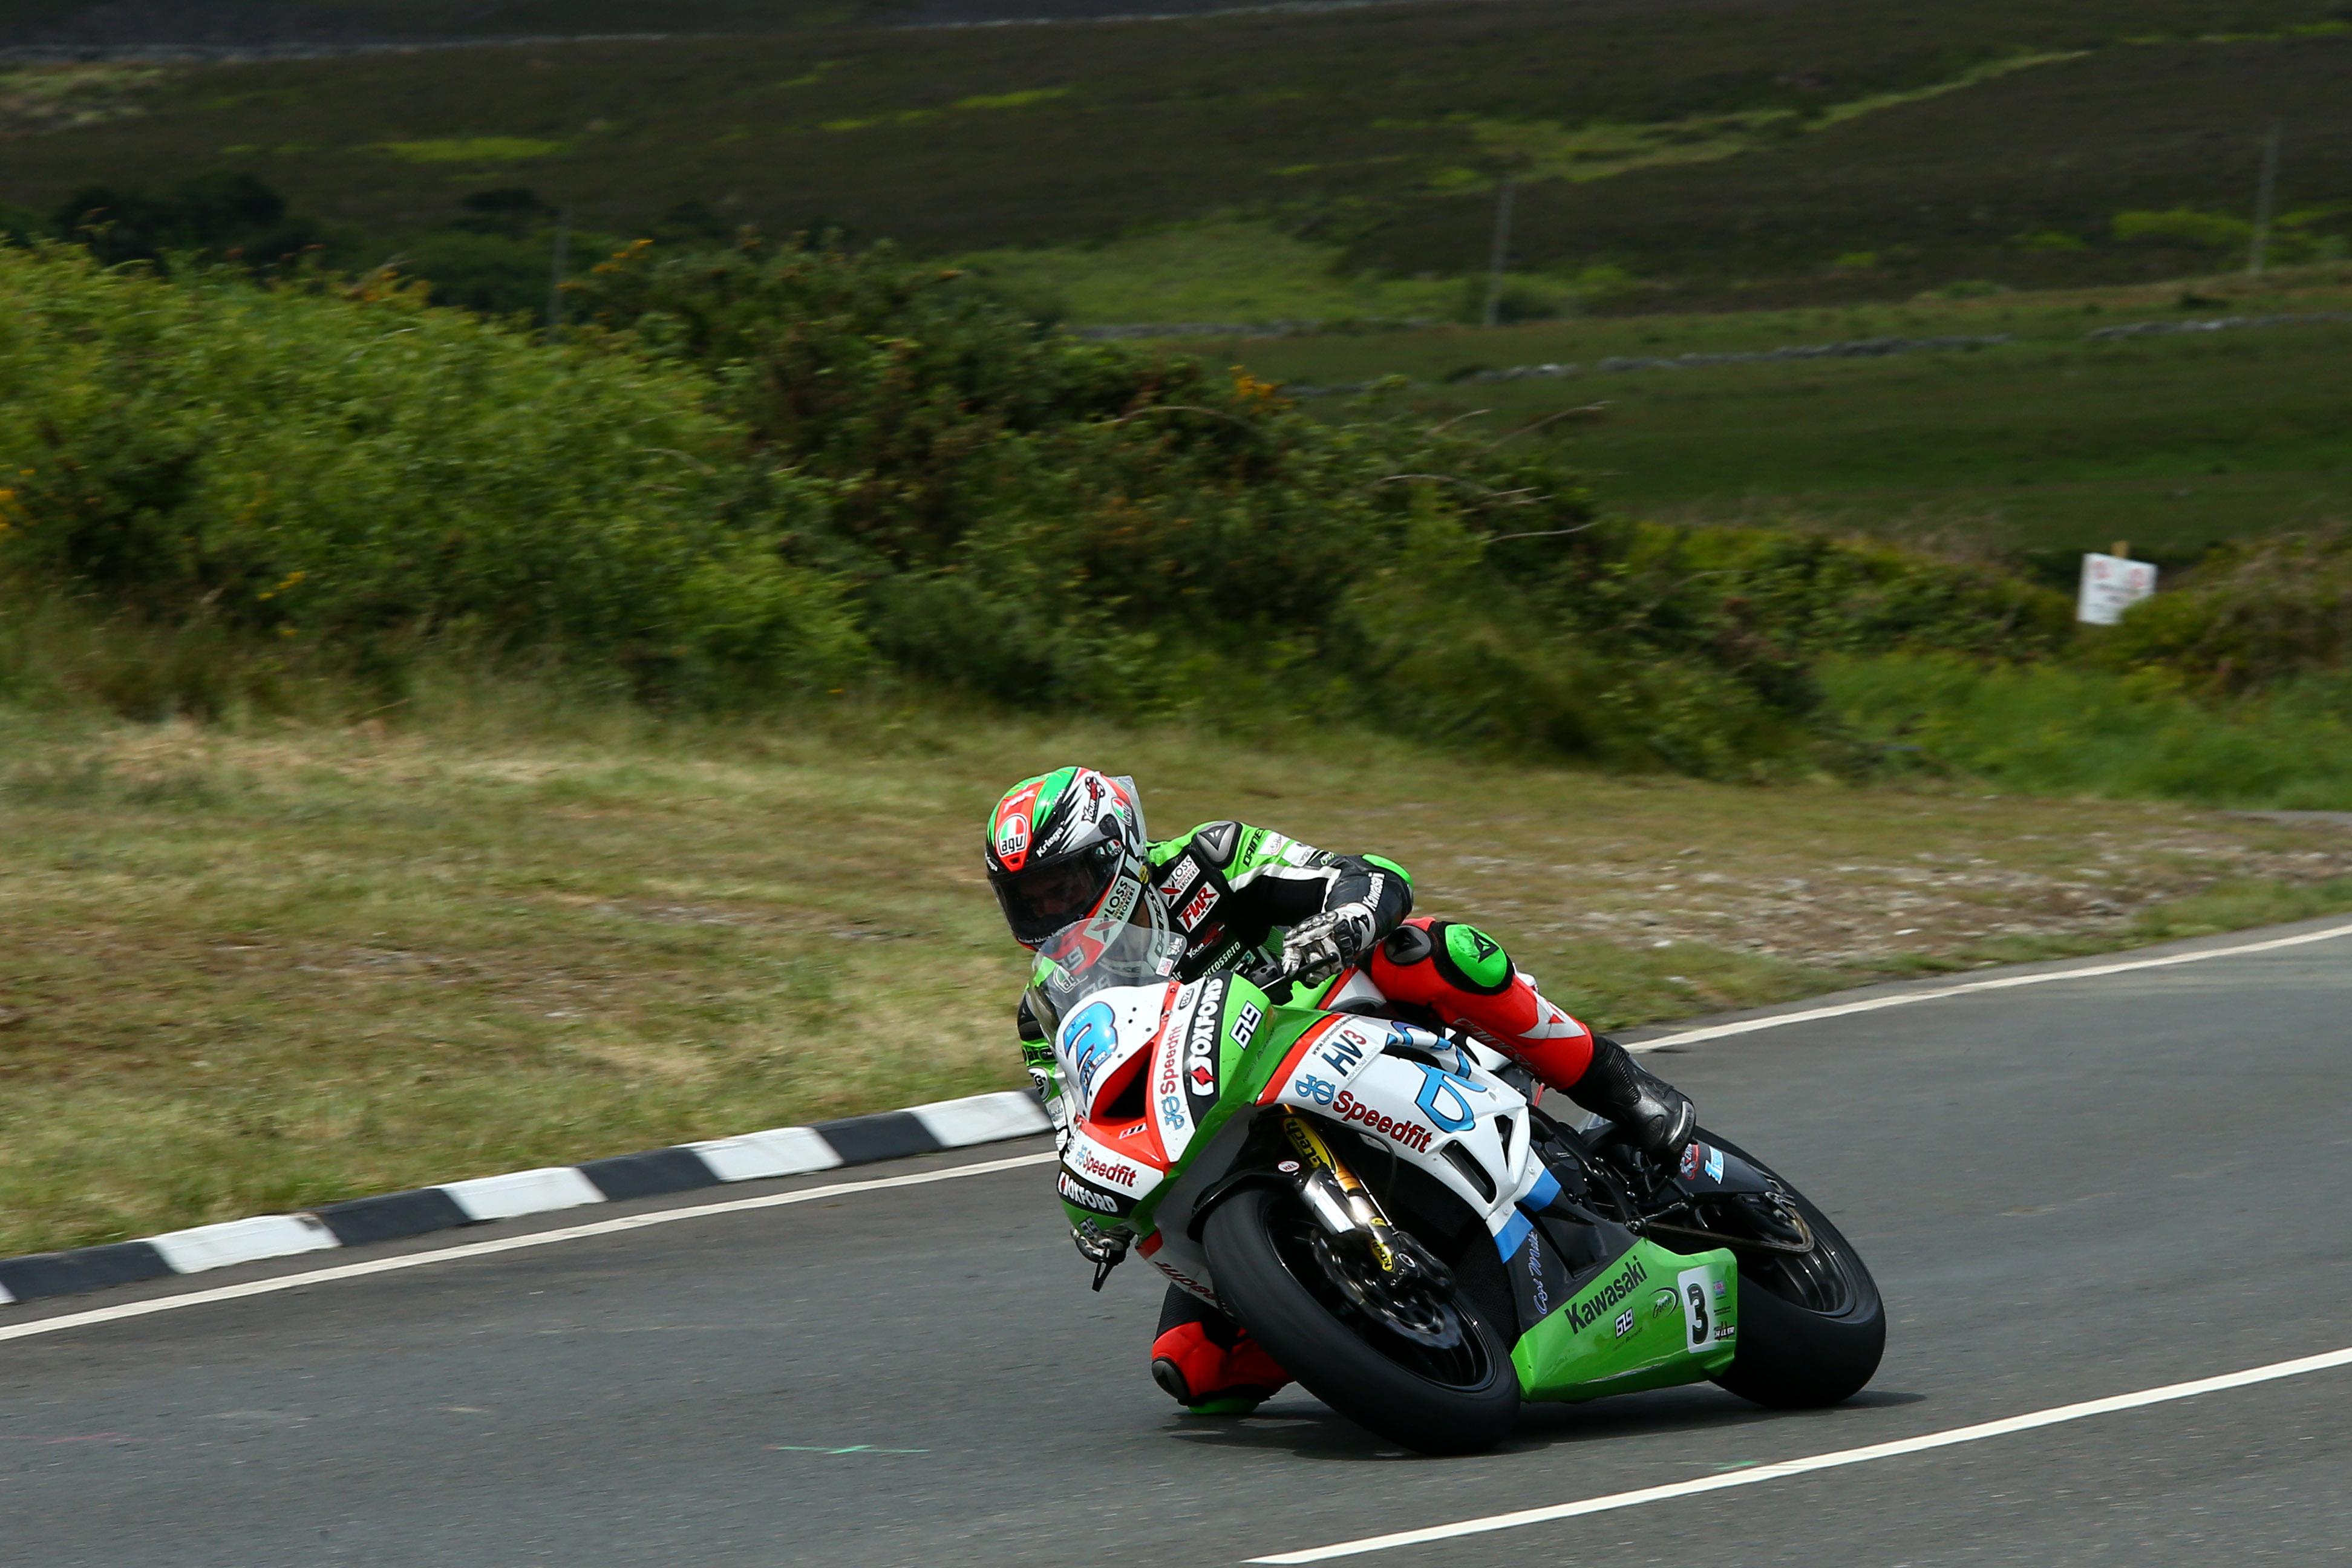 2017 IOM TT, Isle of Man, UK. 4th June 2017. James Hillier, Ringwood, JG Speedfit Kawasaki